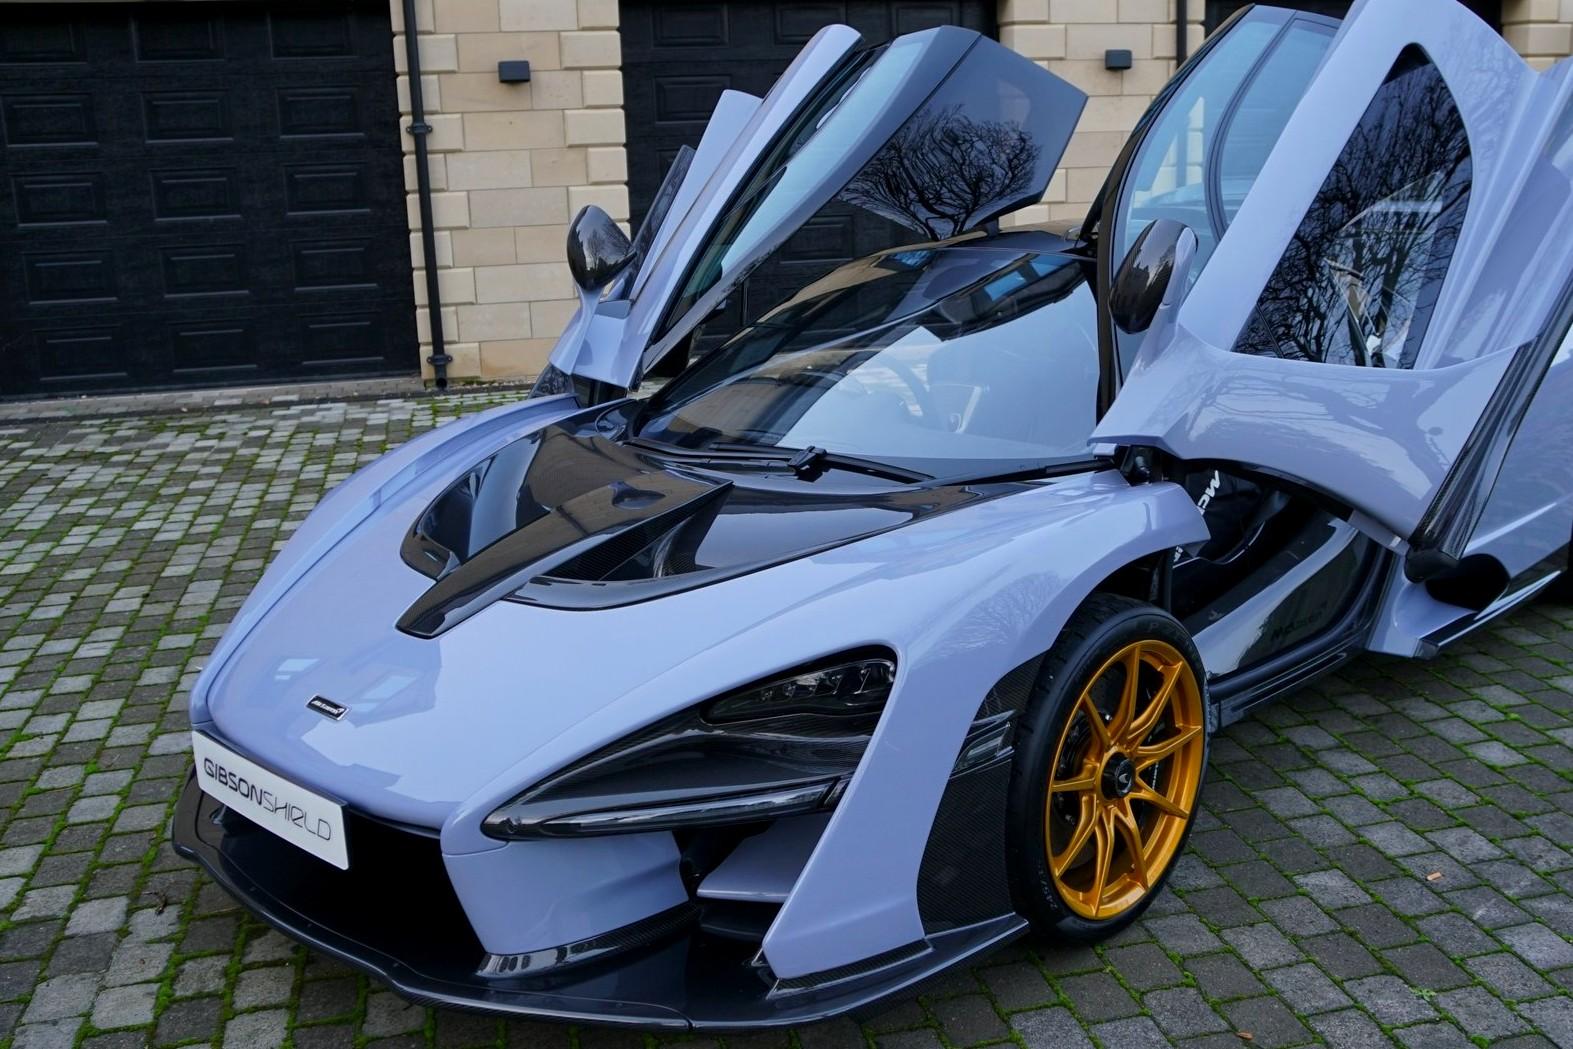 Best exotic cars of all times: 2018 McLaren Senna, Dartington, UK, approx. $1,097,977.